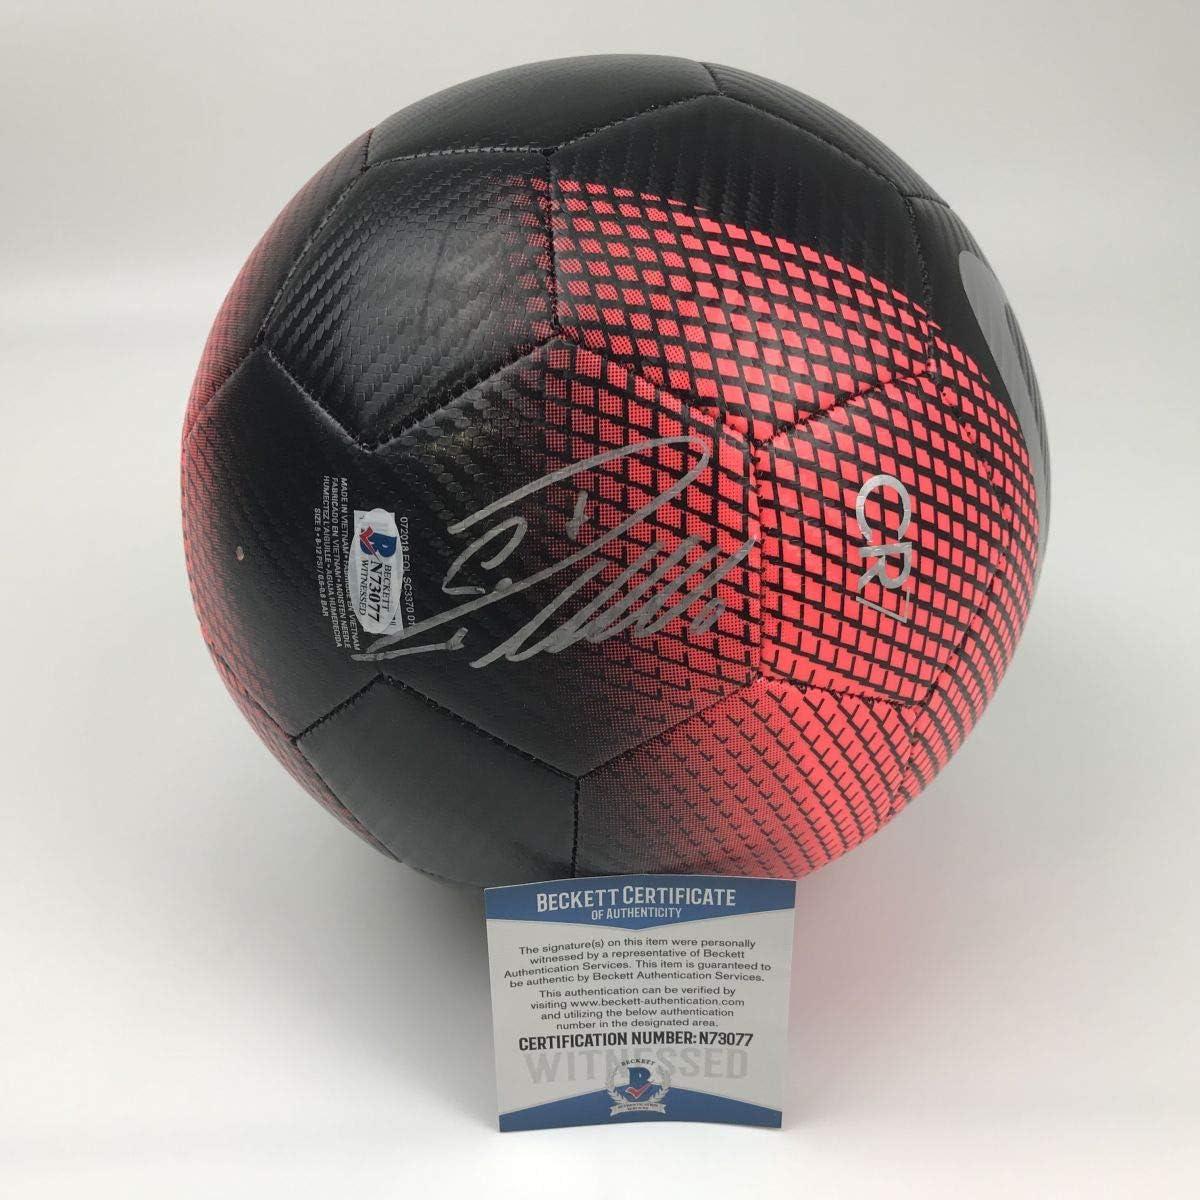 Autographed//Signed Cristiano Ronaldo Juventus Black//Red Soccer Ball Beckett BAS COA Auto